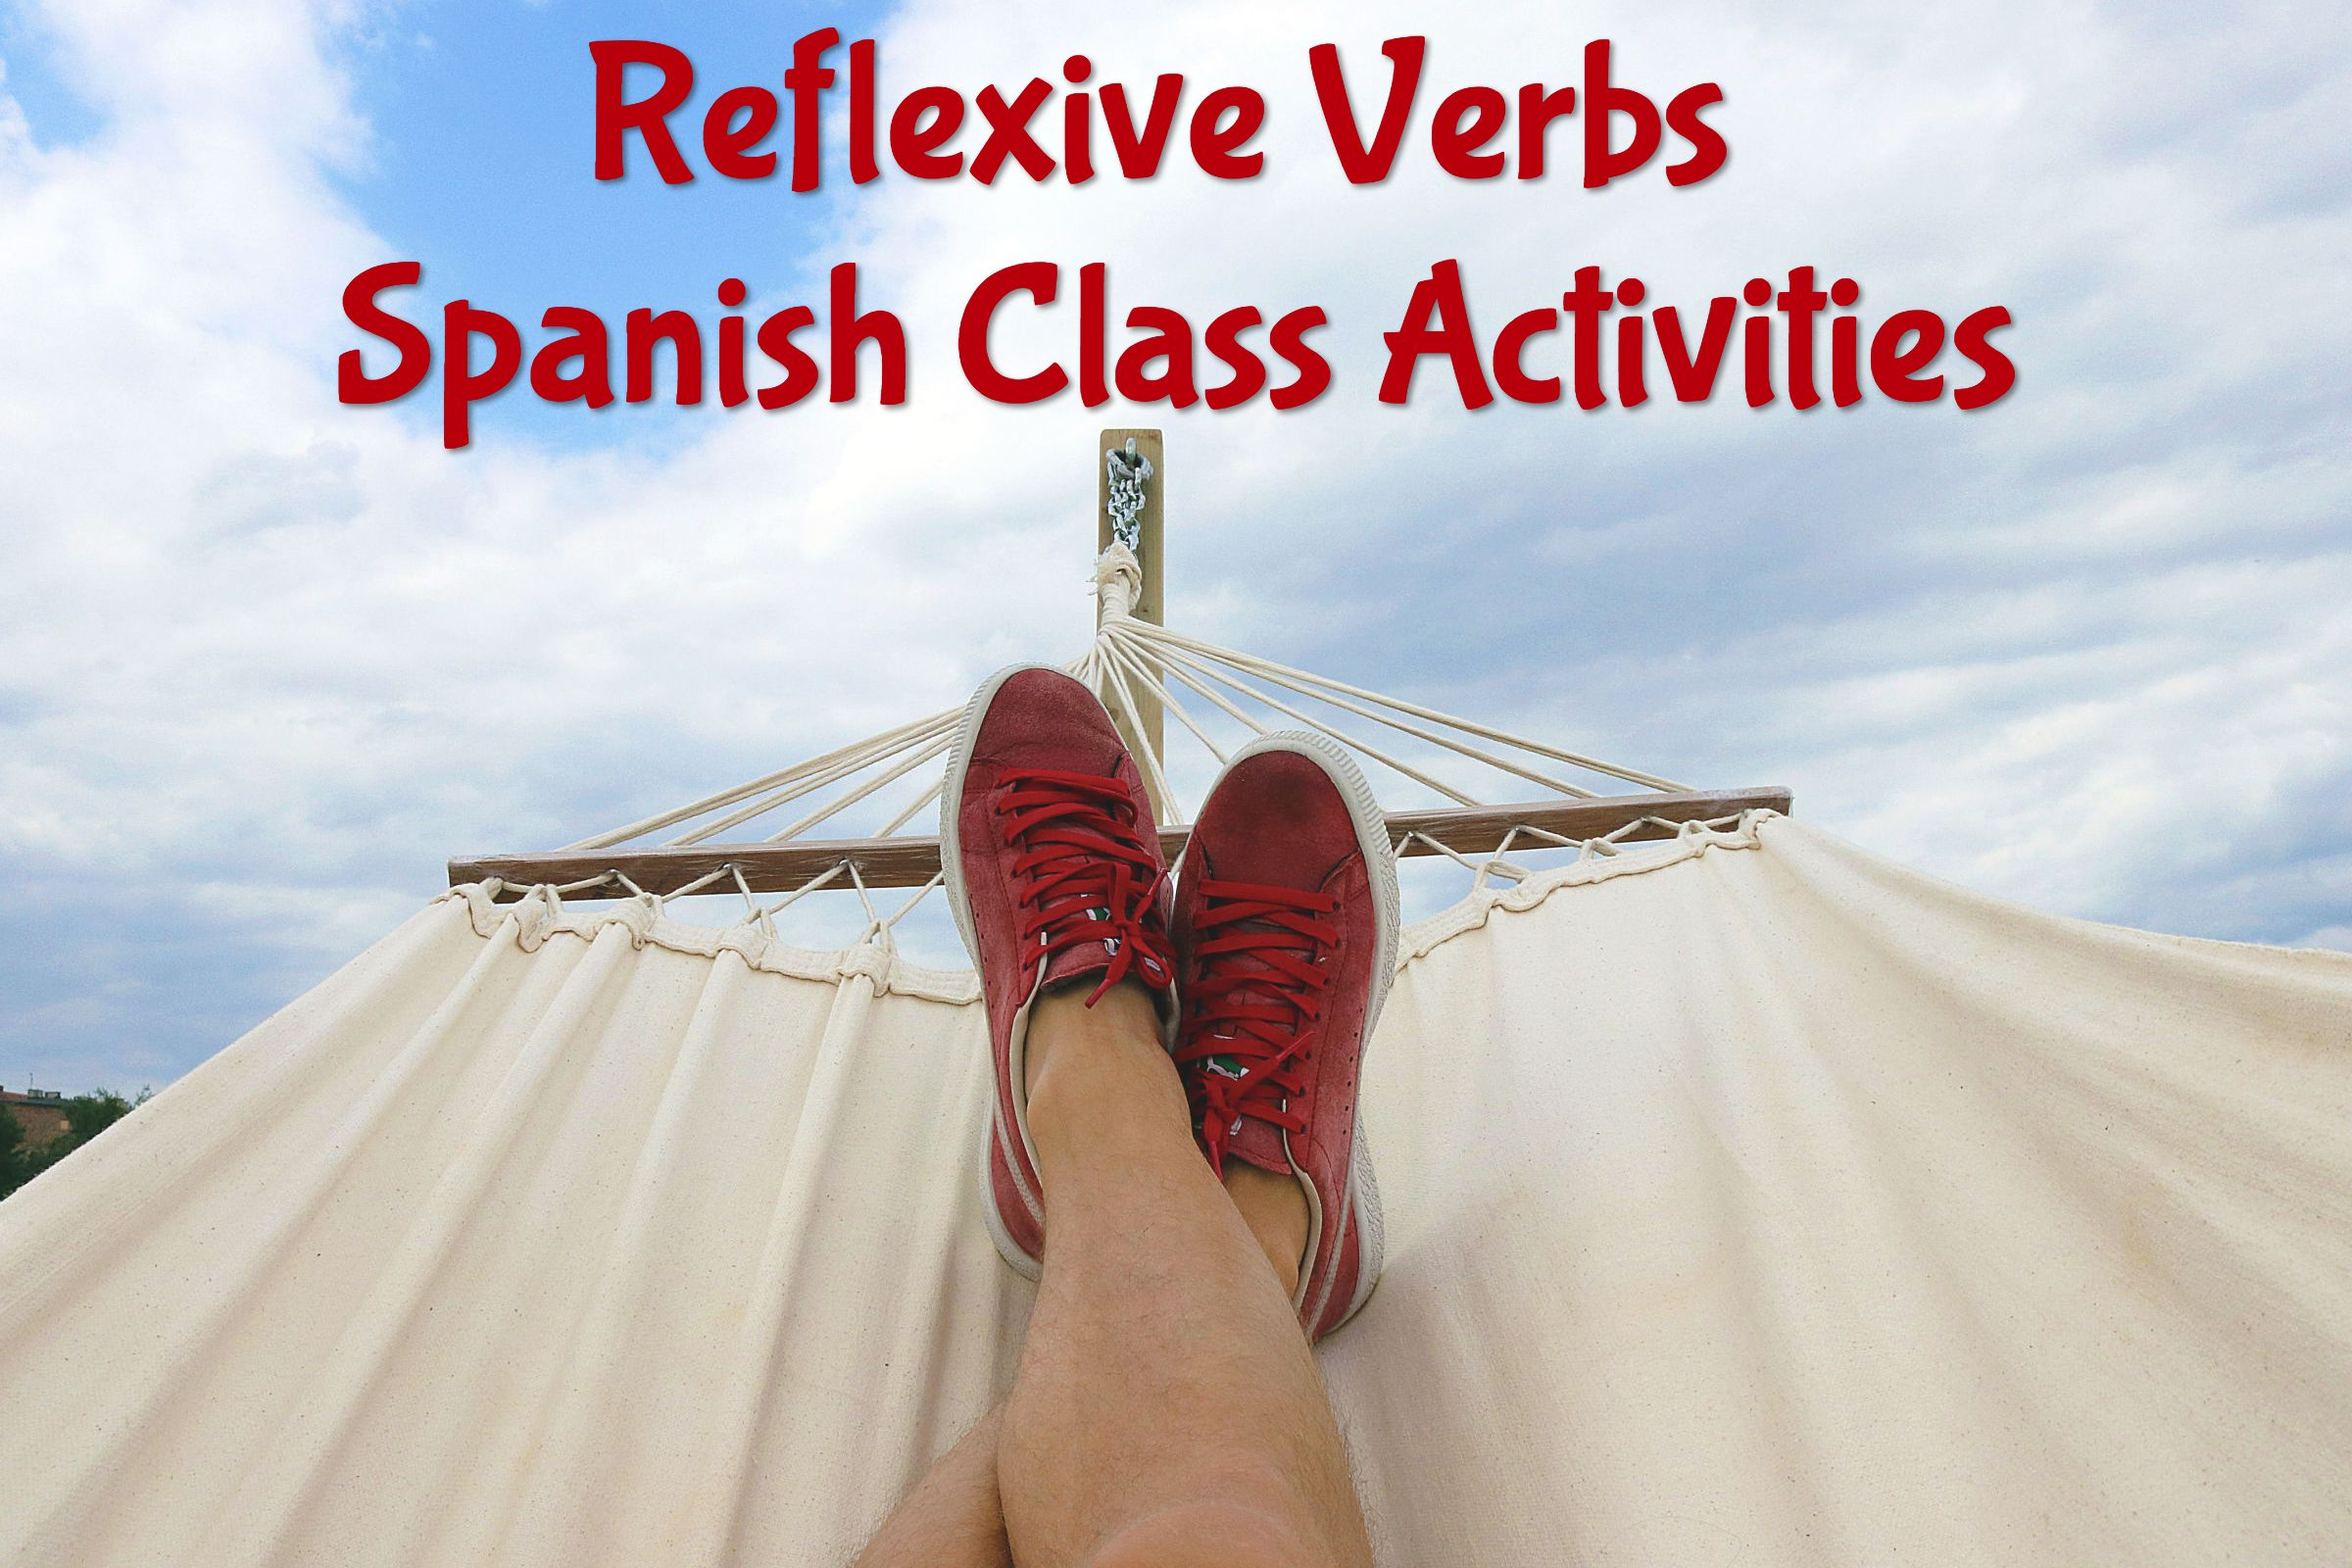 Reflexive Verbs Spanish Class Activities Reflexive Verbs Spanish Learning Activities Spanish Class [ 1600 x 2400 Pixel ]